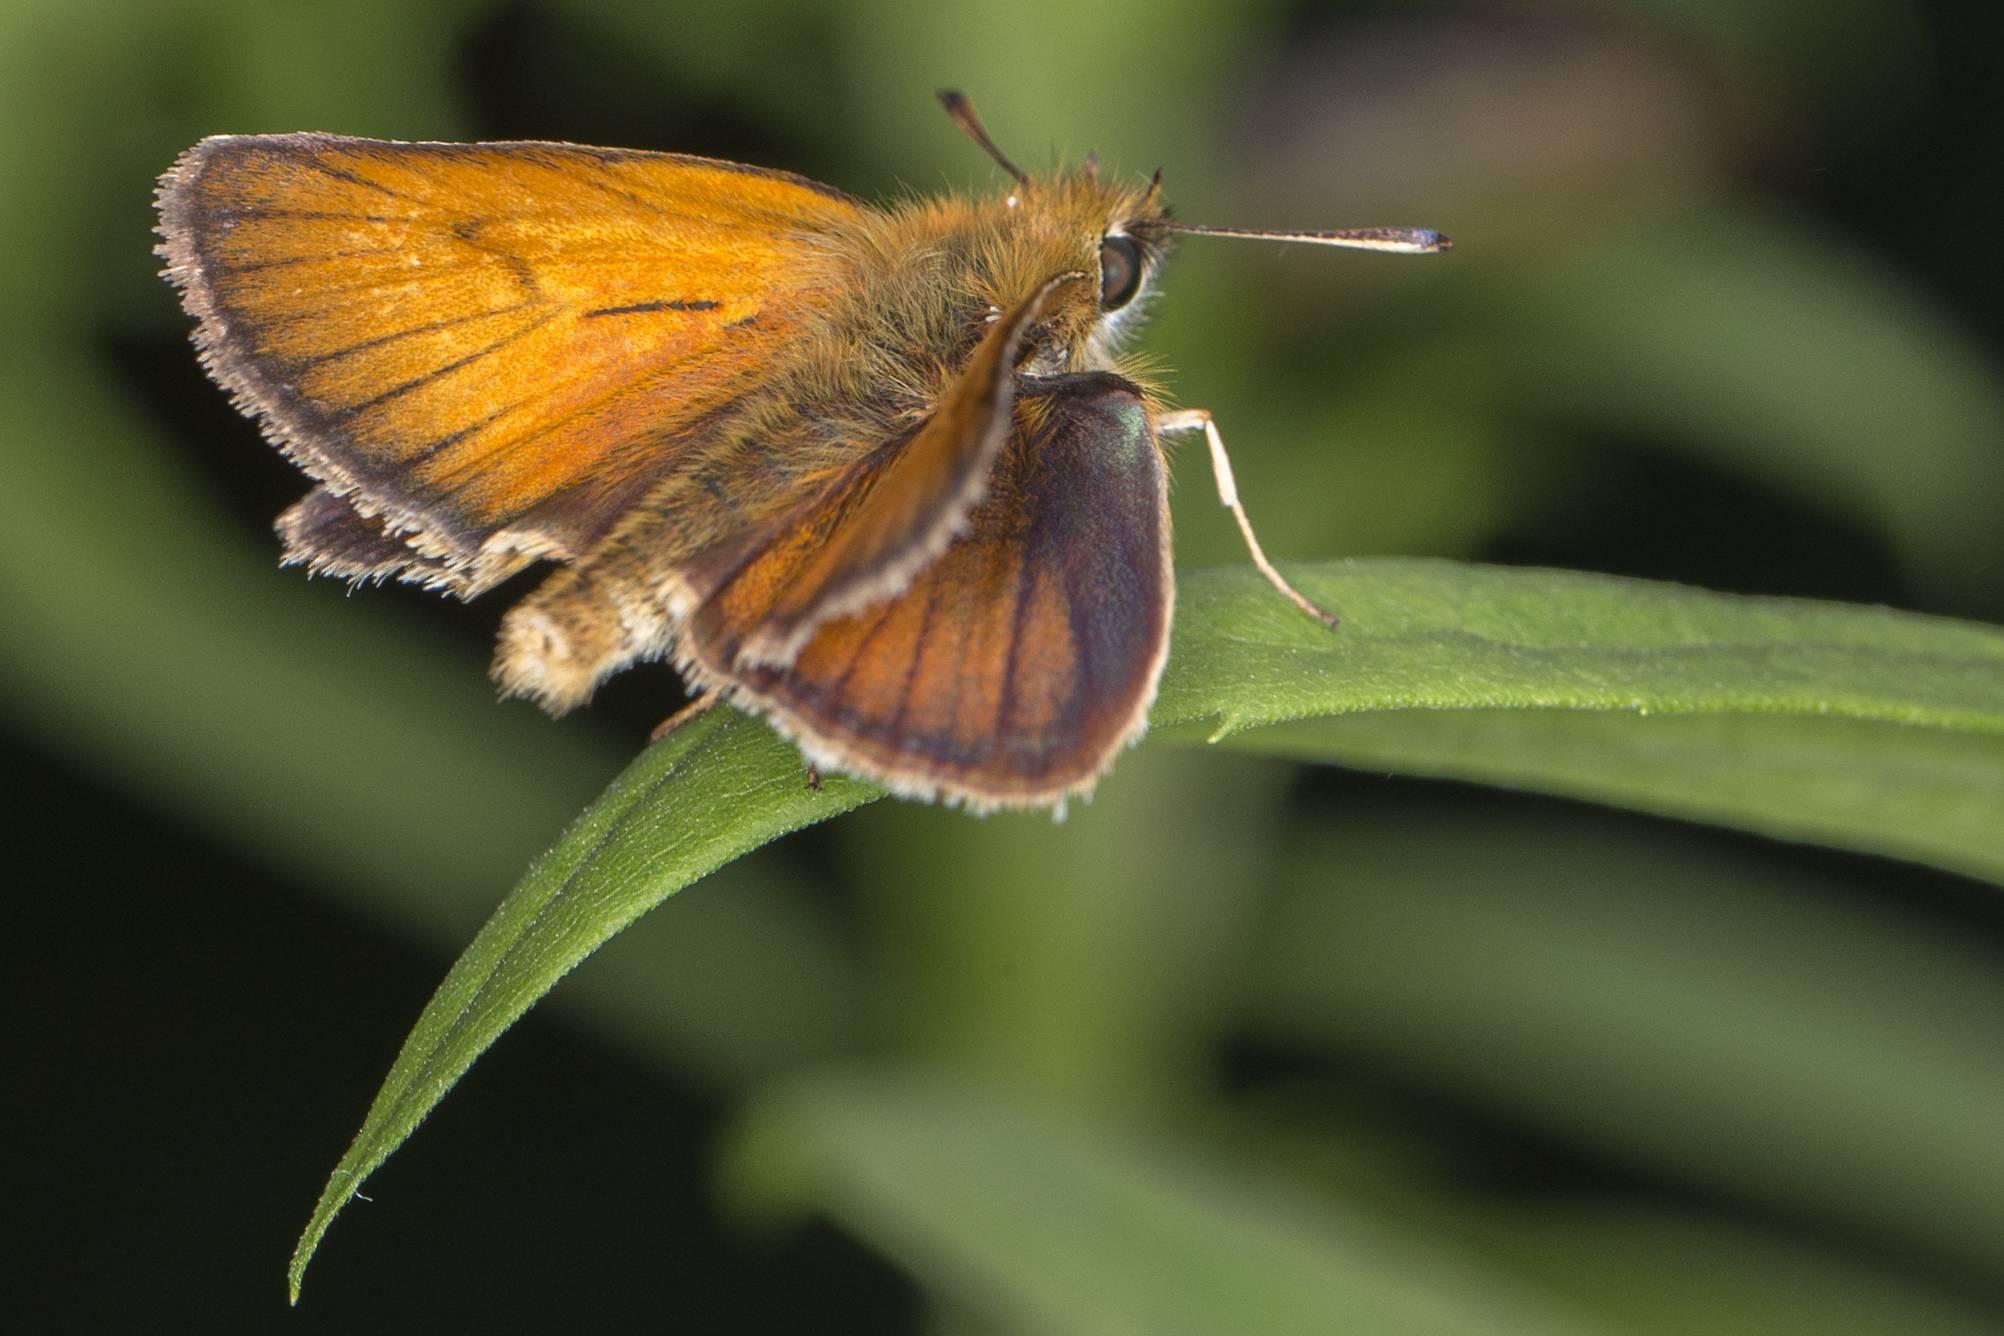 Сатир боровой, или бархатница семела